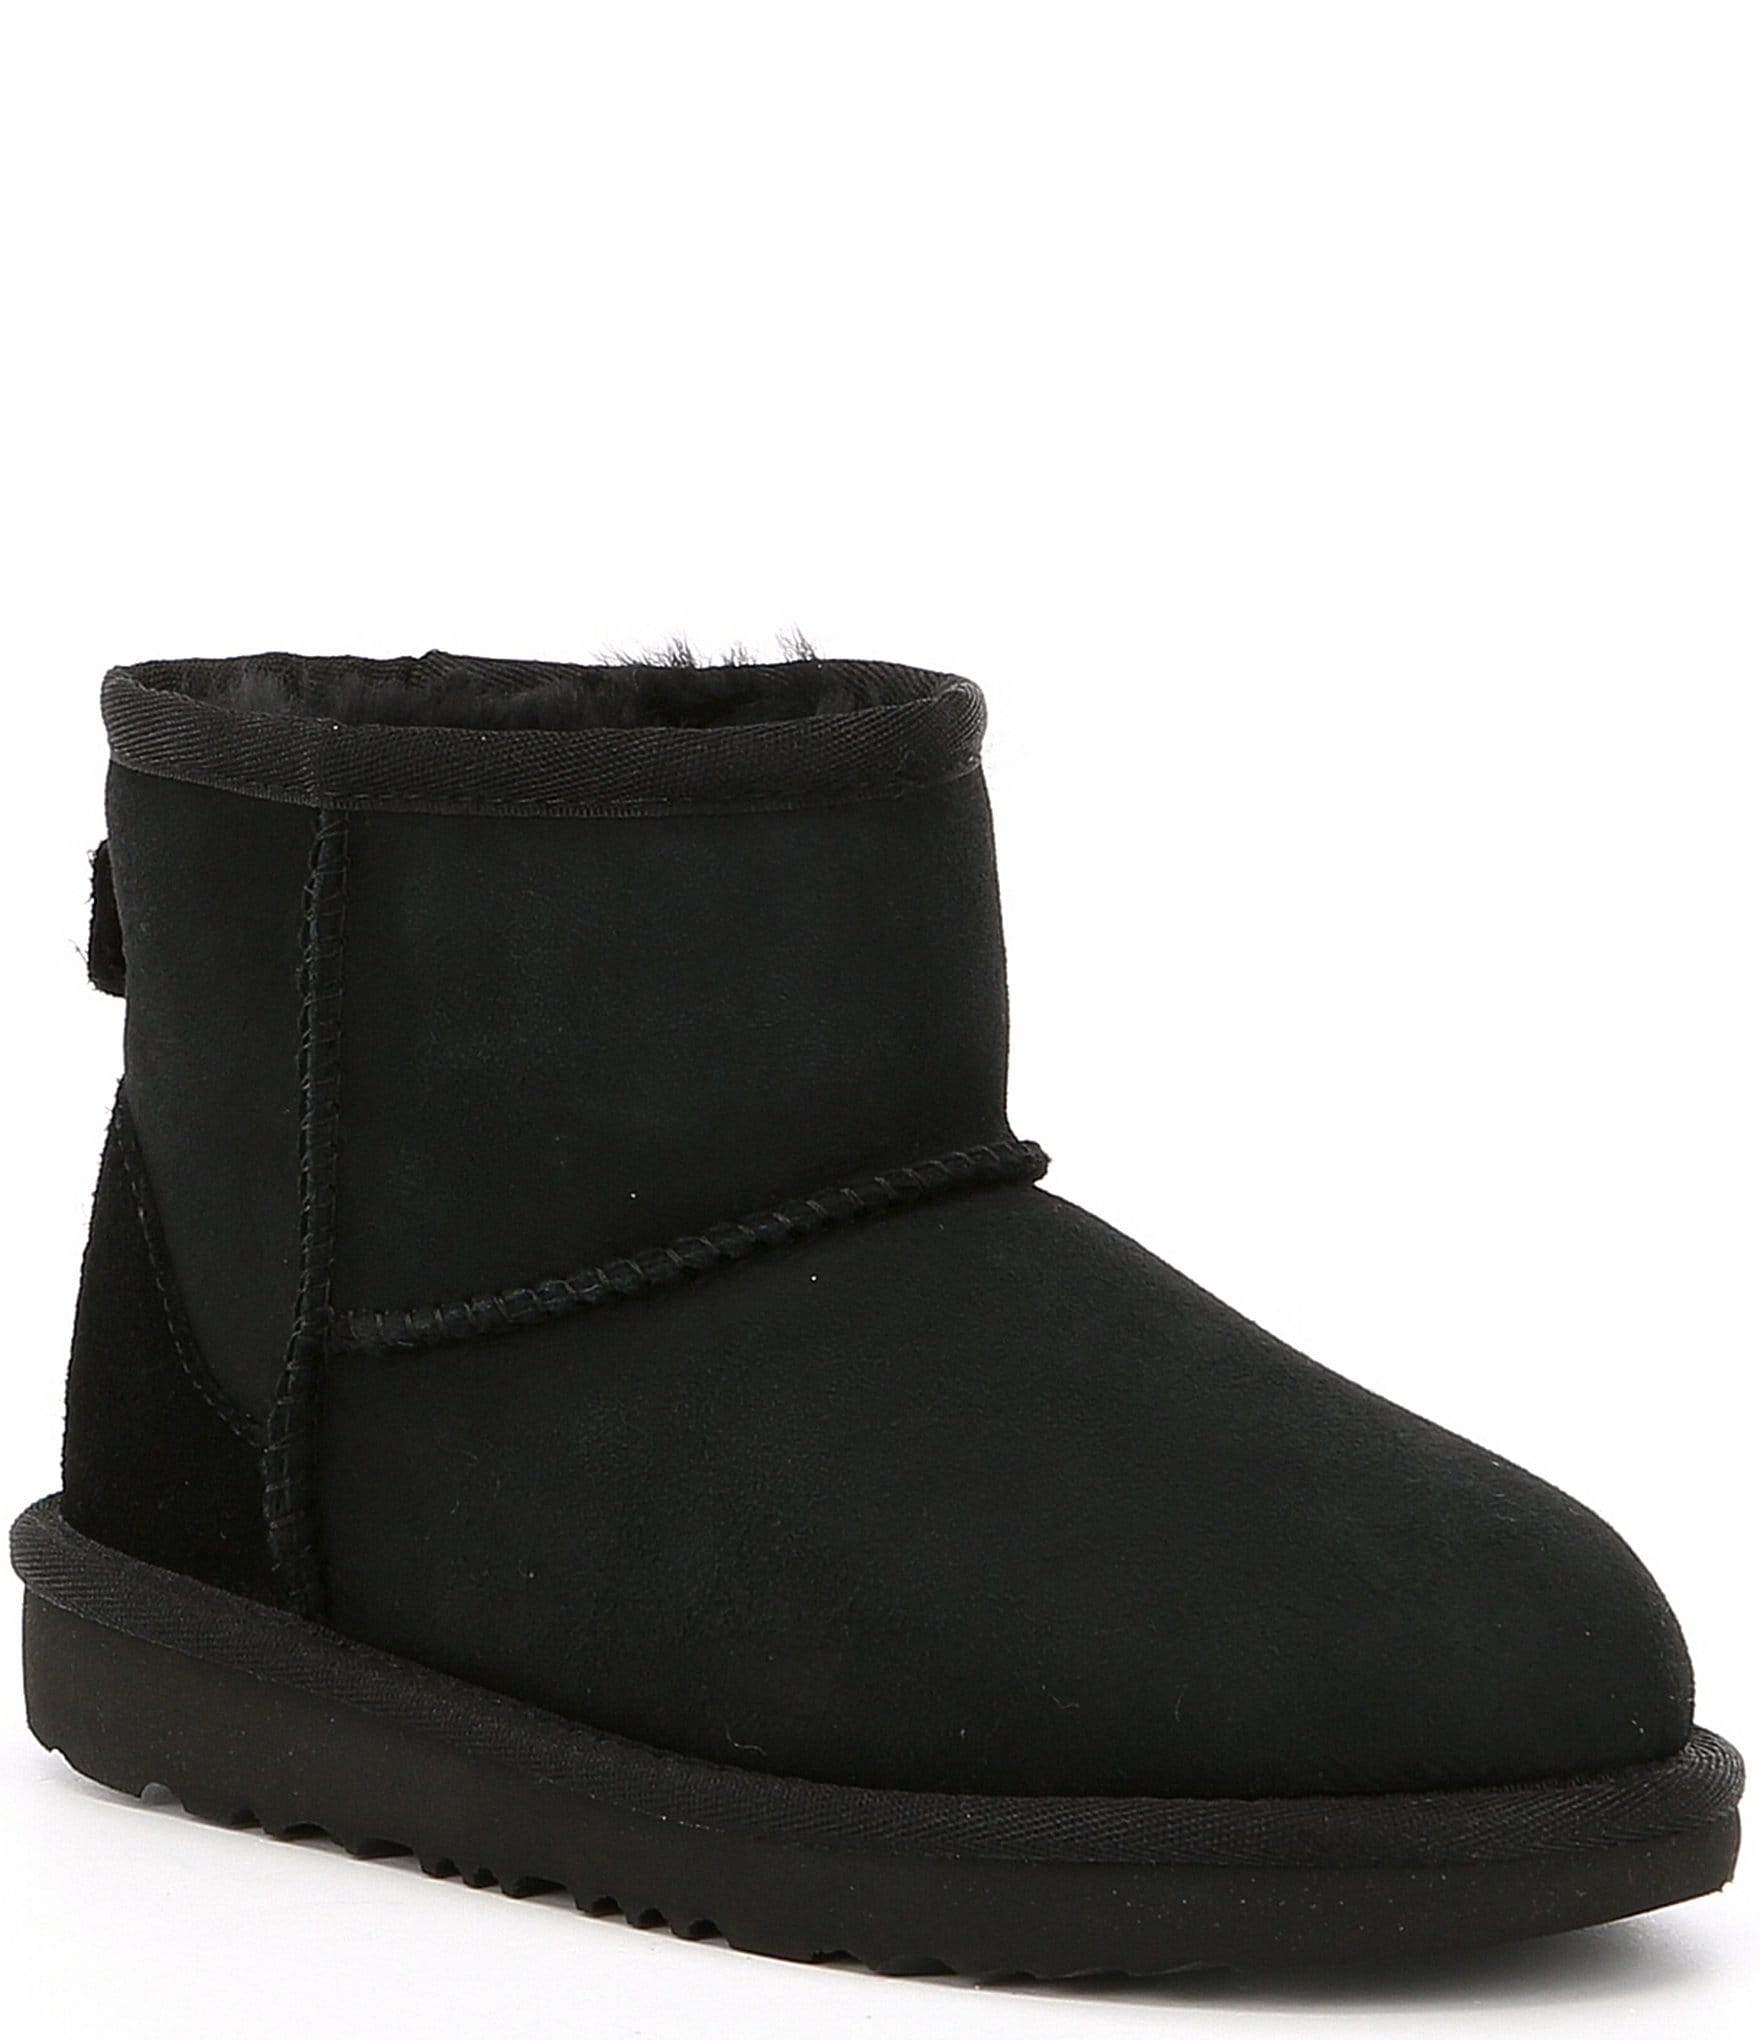 b8870e5eabc UGG® Girls' Classic Mini II Boots | Dillard's